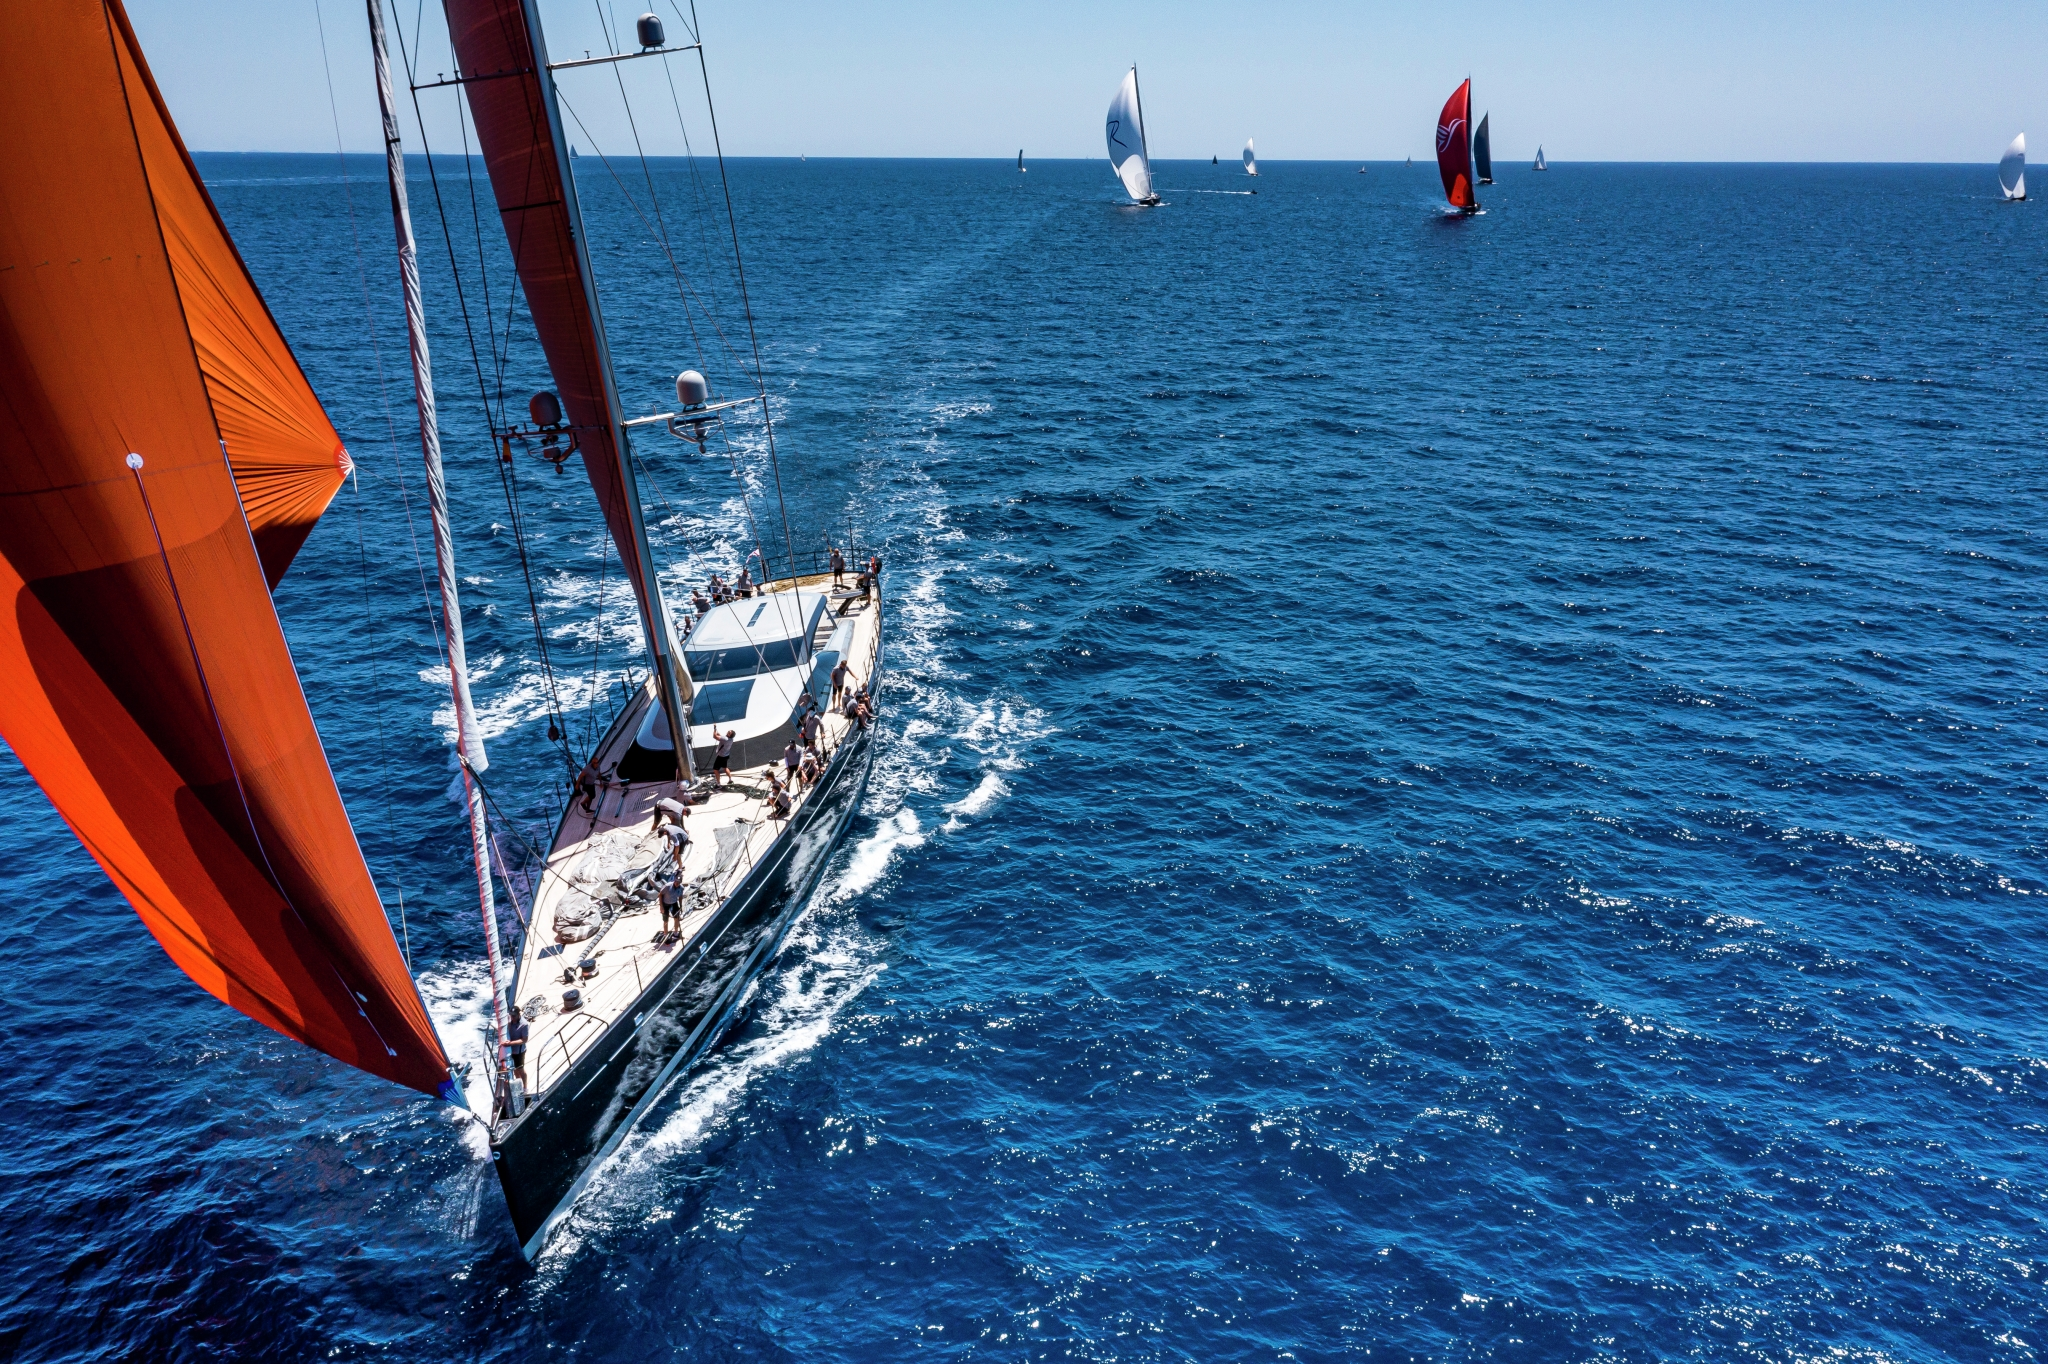 Superyacht Cup Palma 2021, kite run